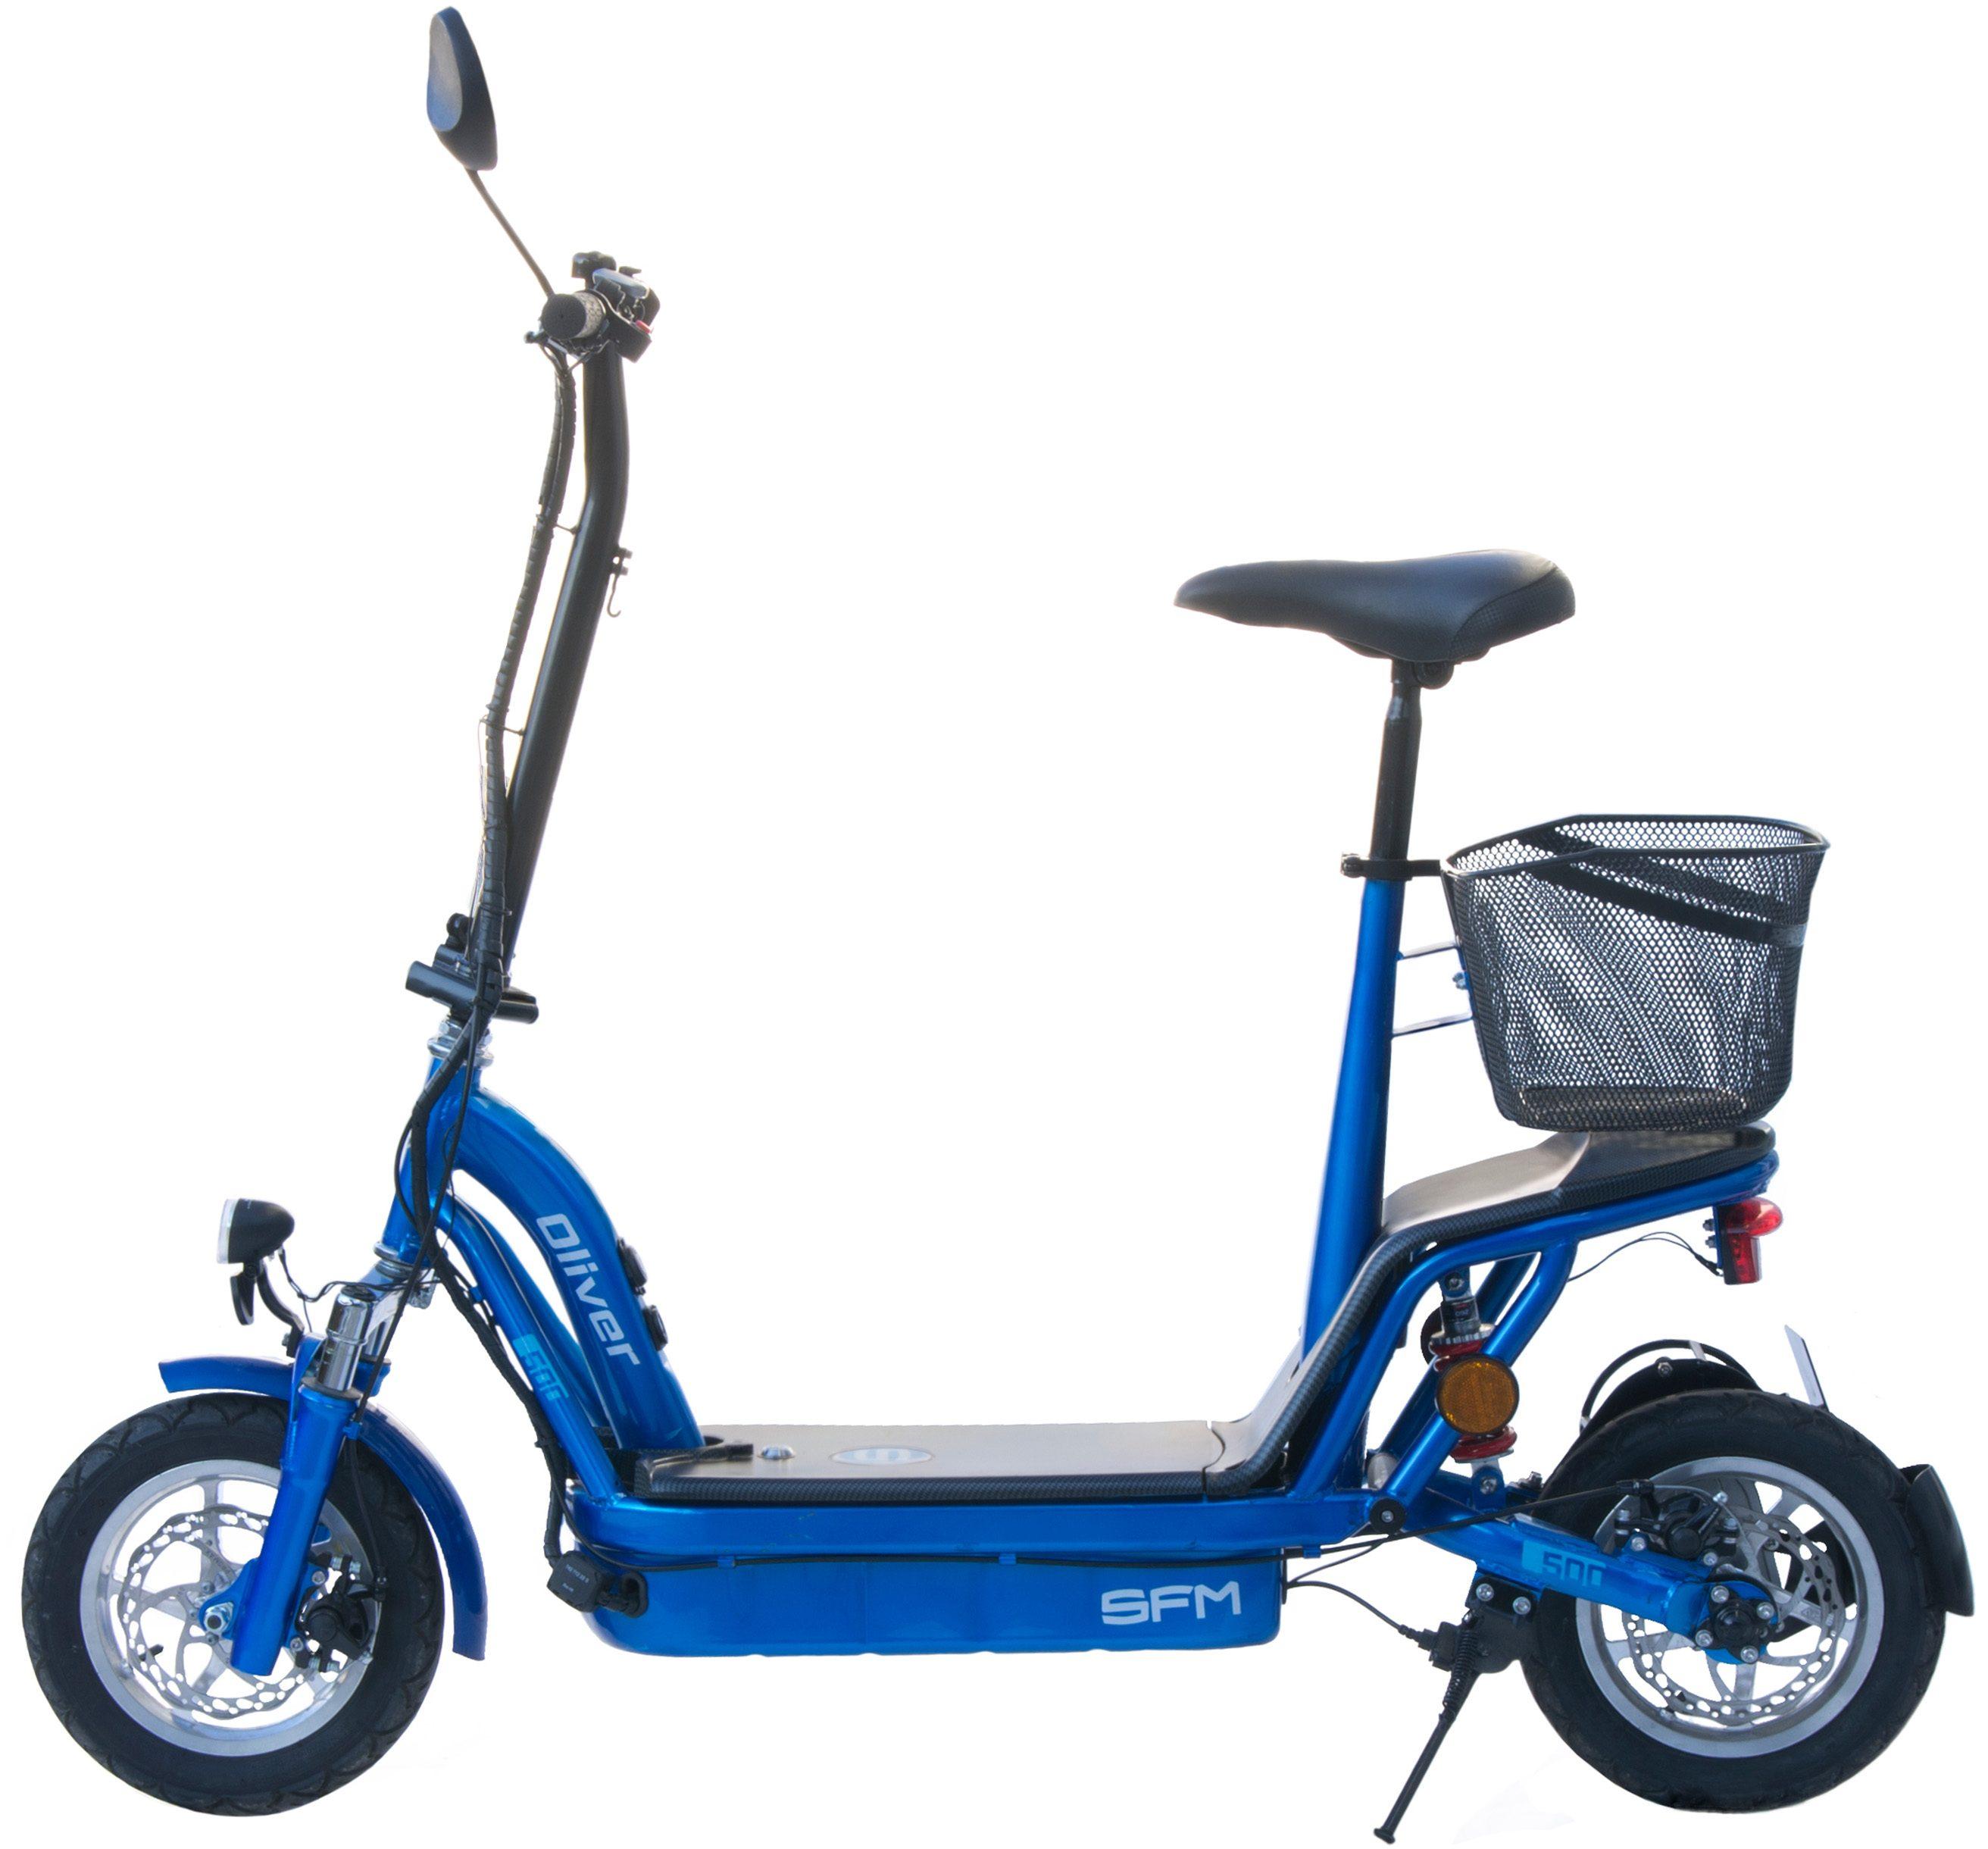 SFM Elektro-Roller, 20 km/h, 36V 12AH Blei-Gel-Akku, 500 W Elektromotor , »Oliver 500«